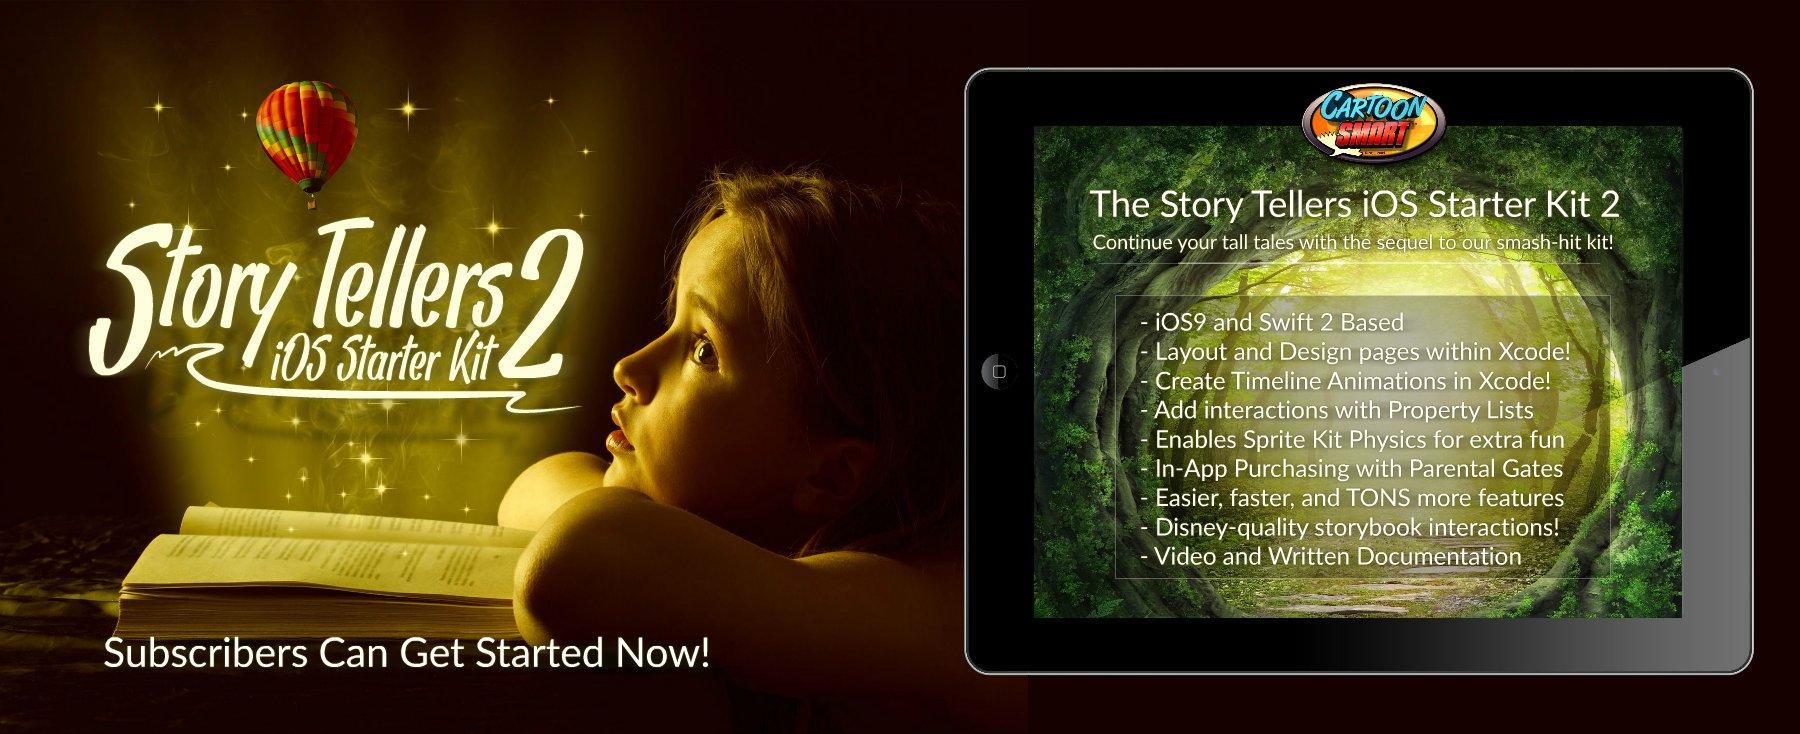 iOS9 Starter Kit StoryBook App Frontpage